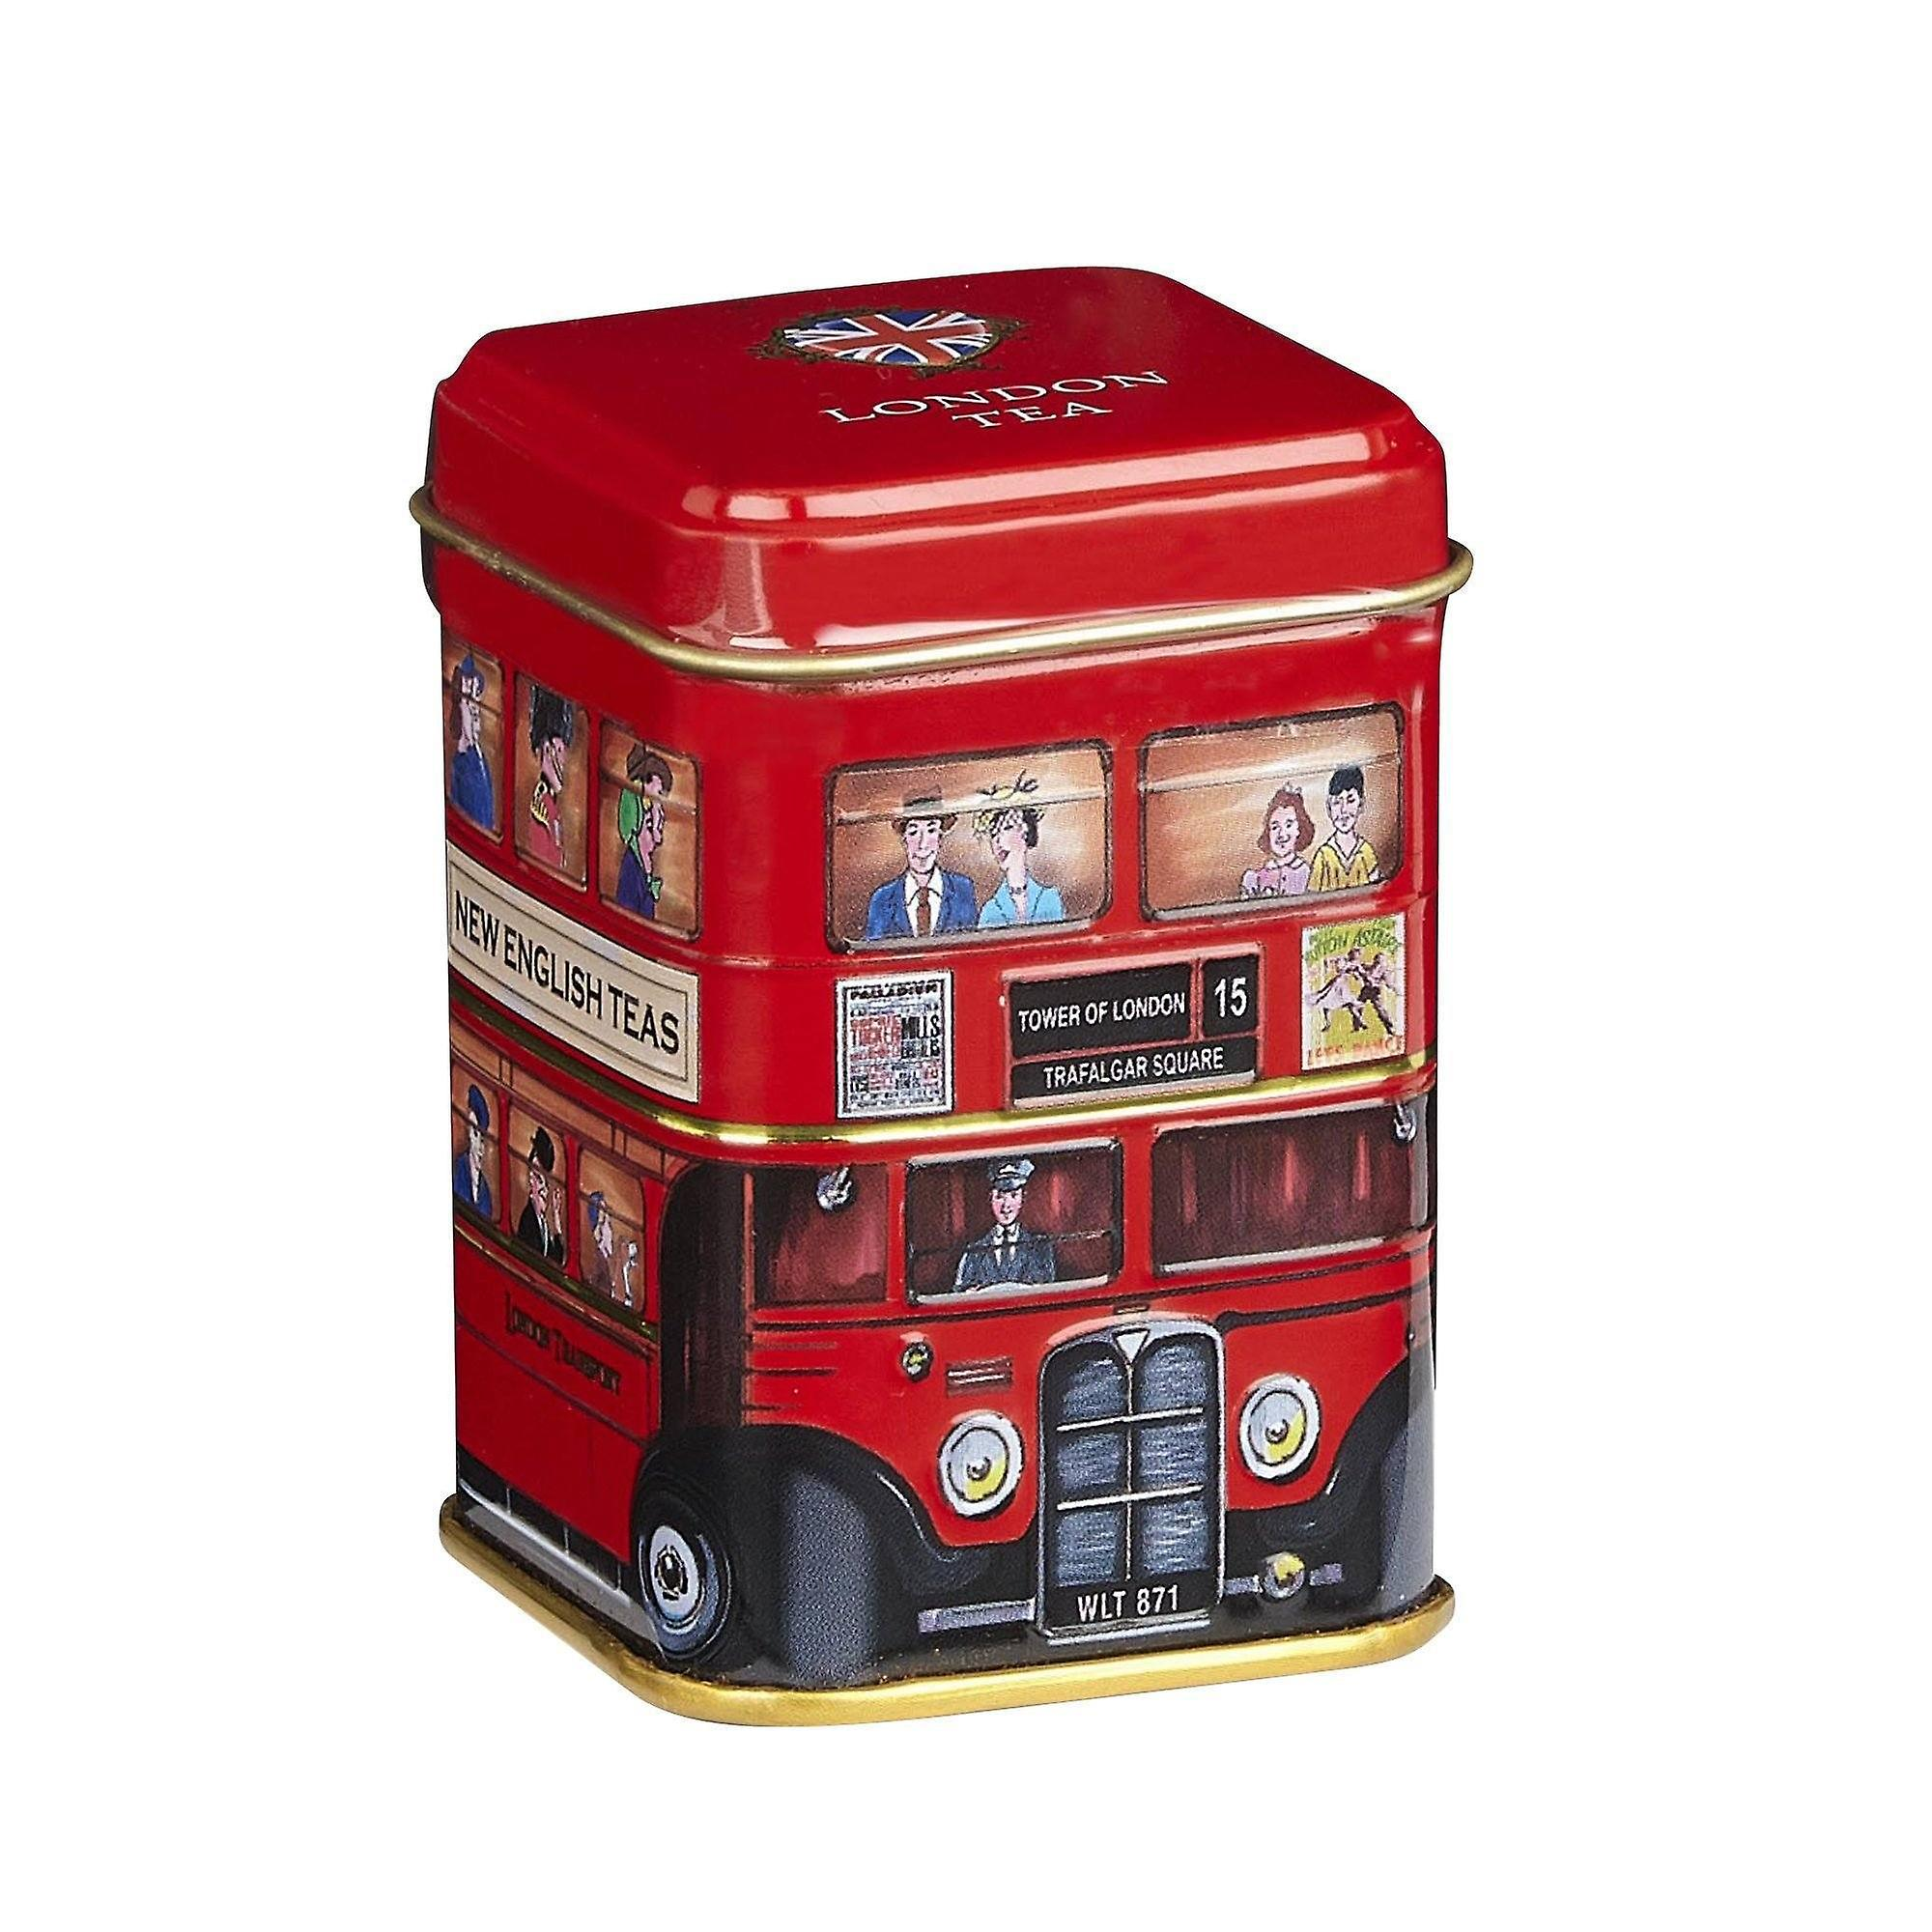 London bus english breakfast tea mini tin 25g